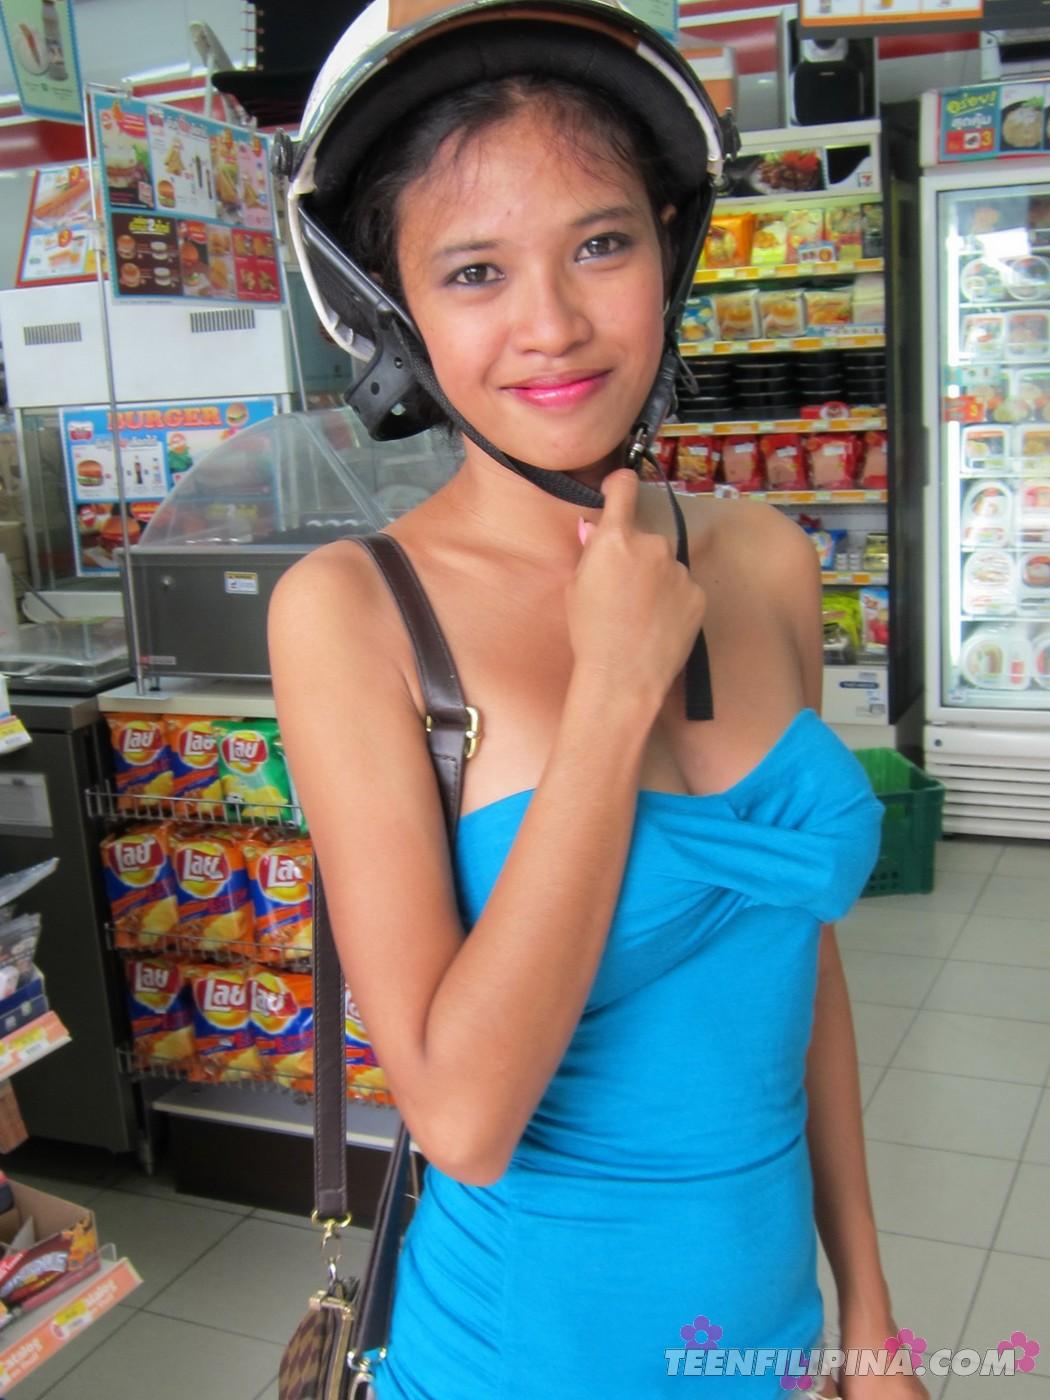 More real Thai girl friend fun in Pattaya with insane GF ...